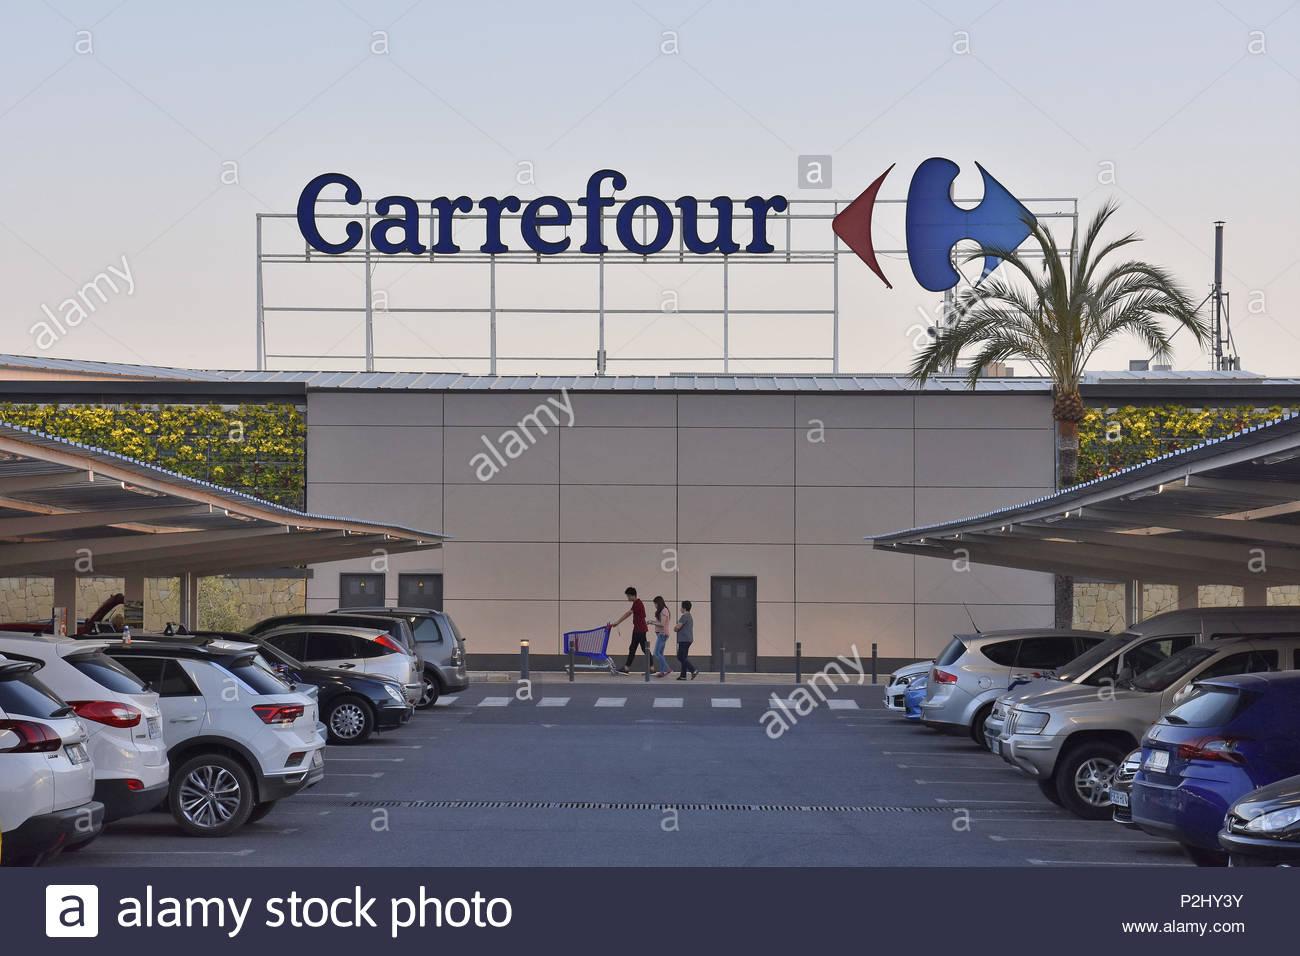 Azionamento Esterno Carrefour